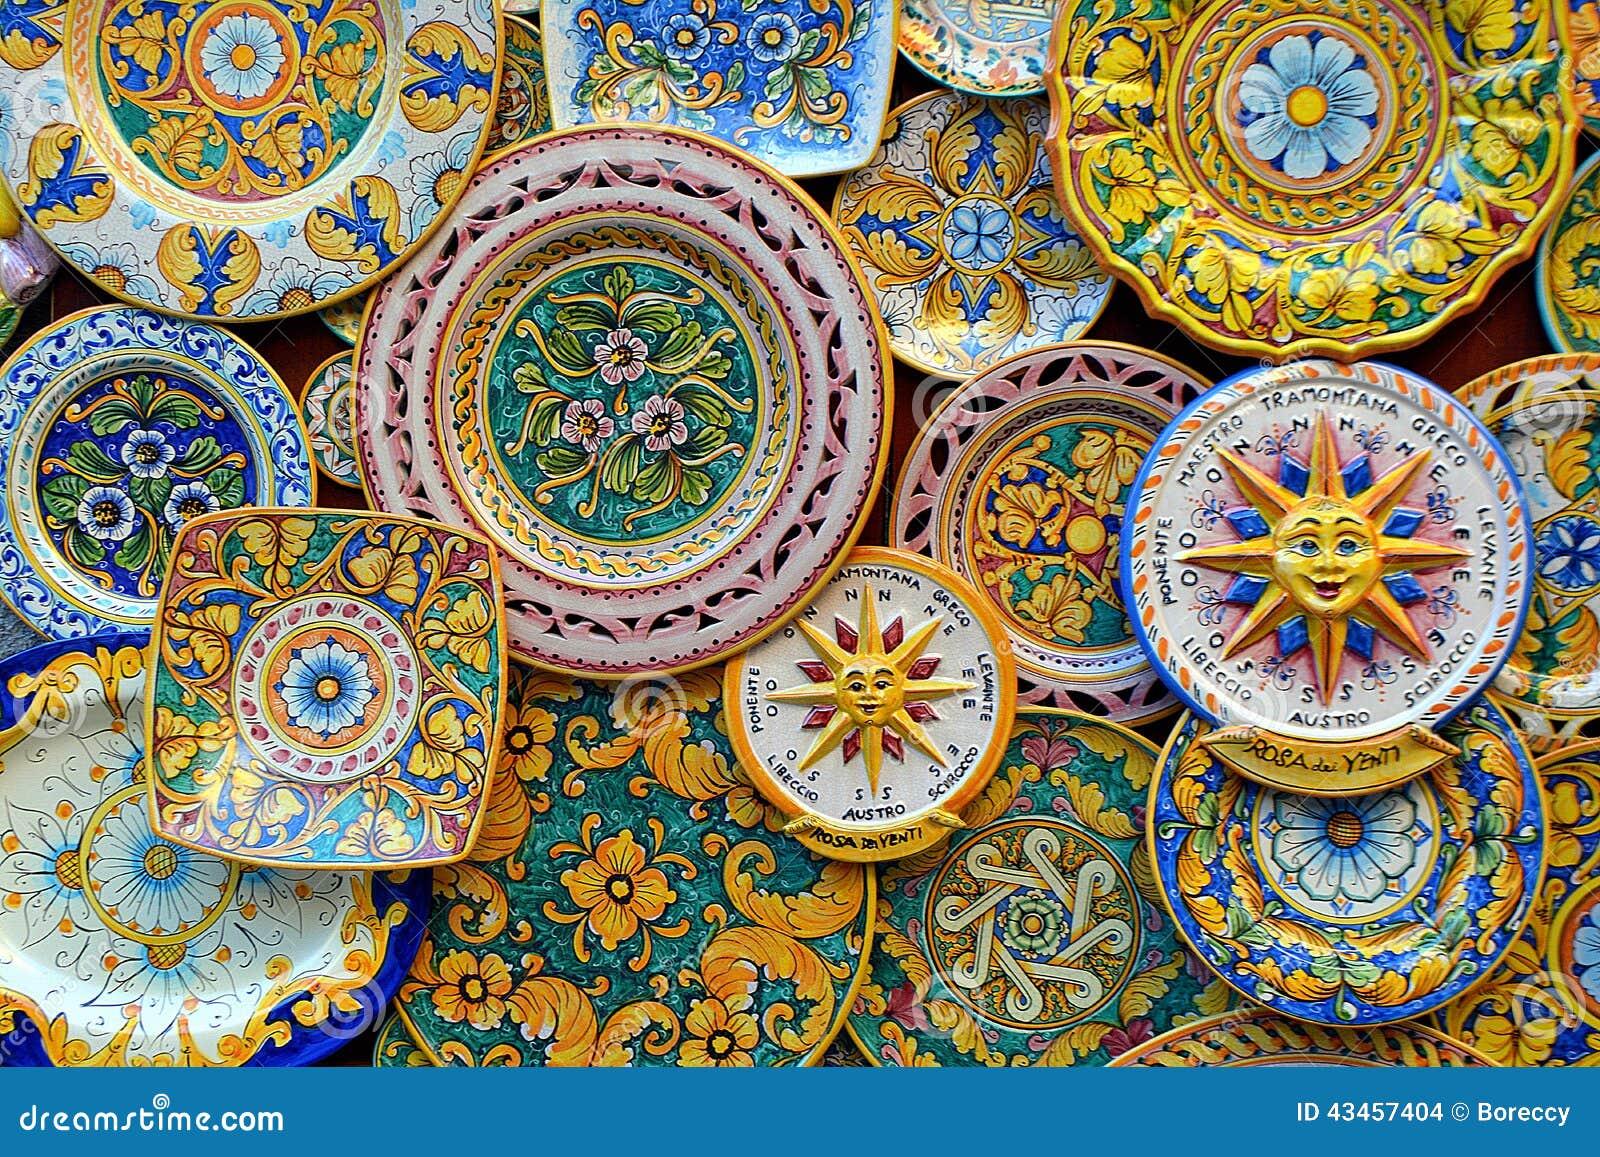 ceramic plates classic sicilian style sale erice outside souvenir shop sicily italy 43457404